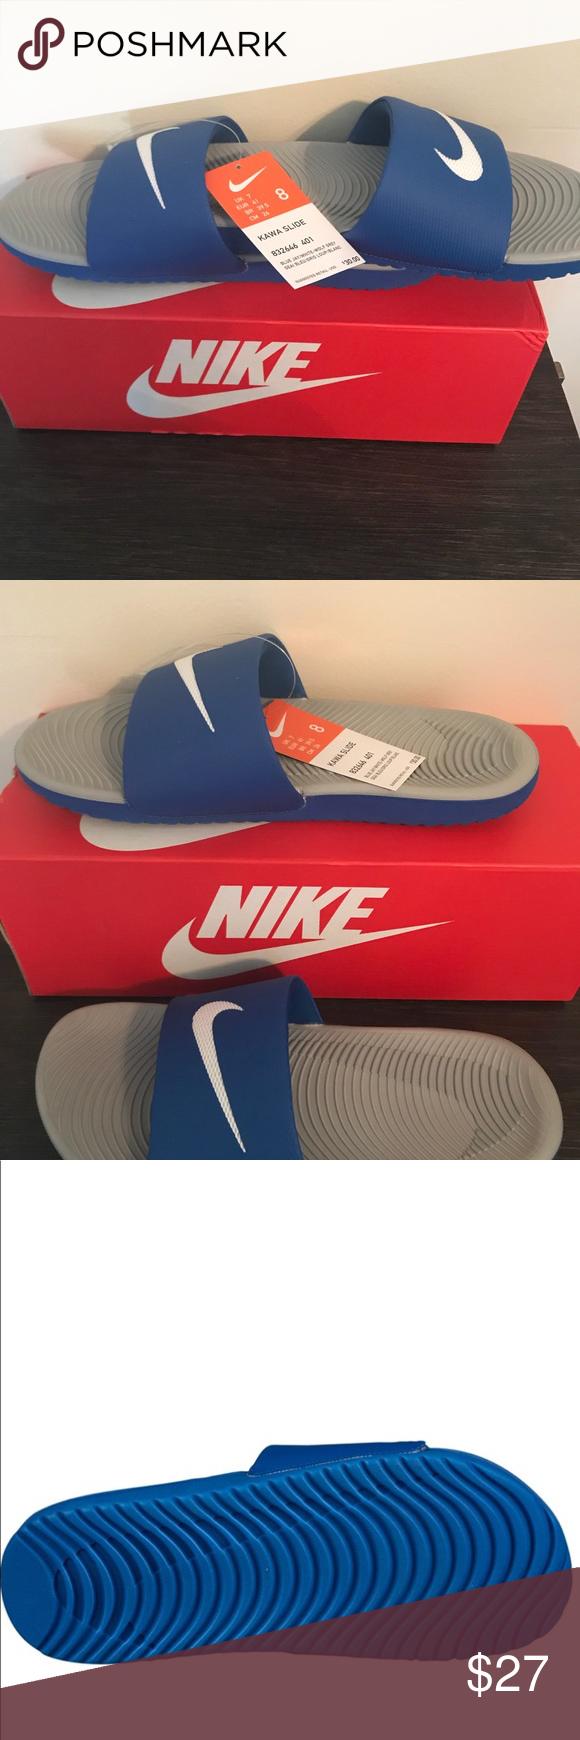 pretty nice bf24d 7a2de Nike slipper Brand new Nike slipper in box size 8 Nike Shoes ...